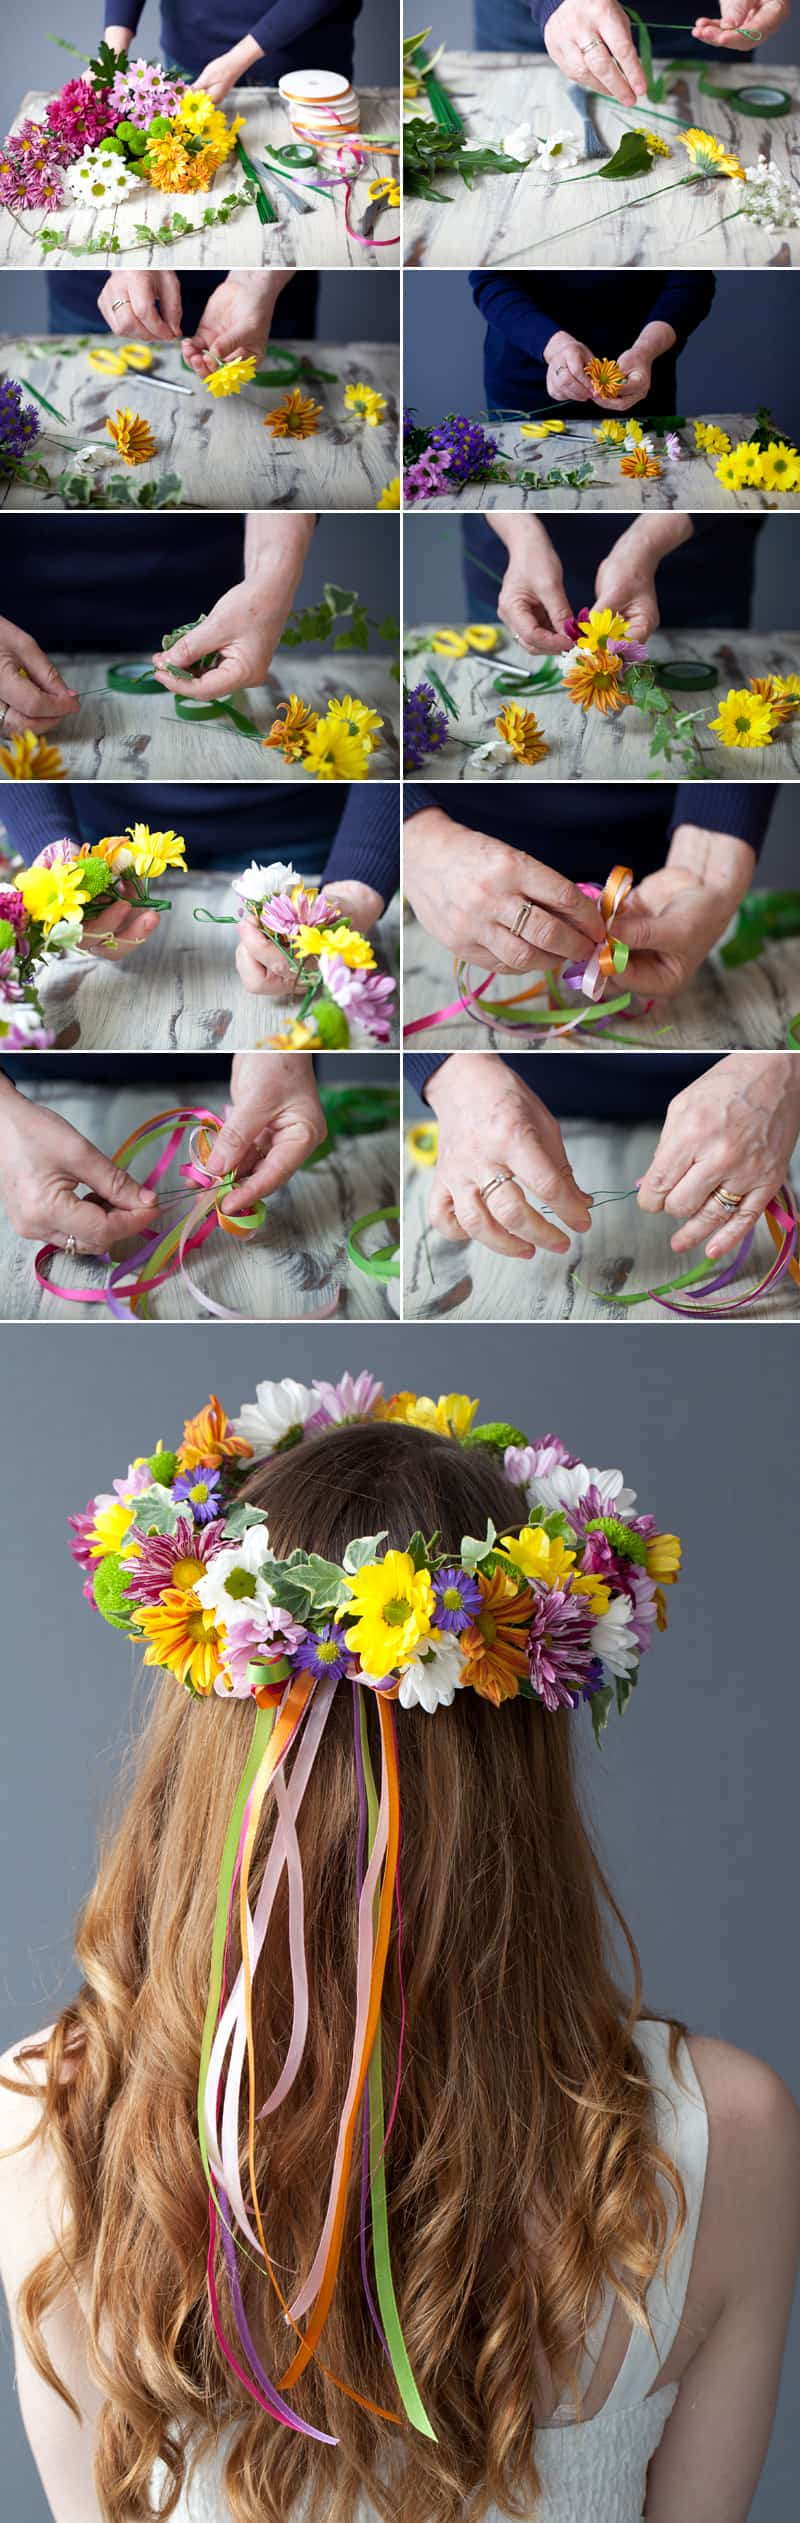 How to Make a Vibrant Hair Garland DIY